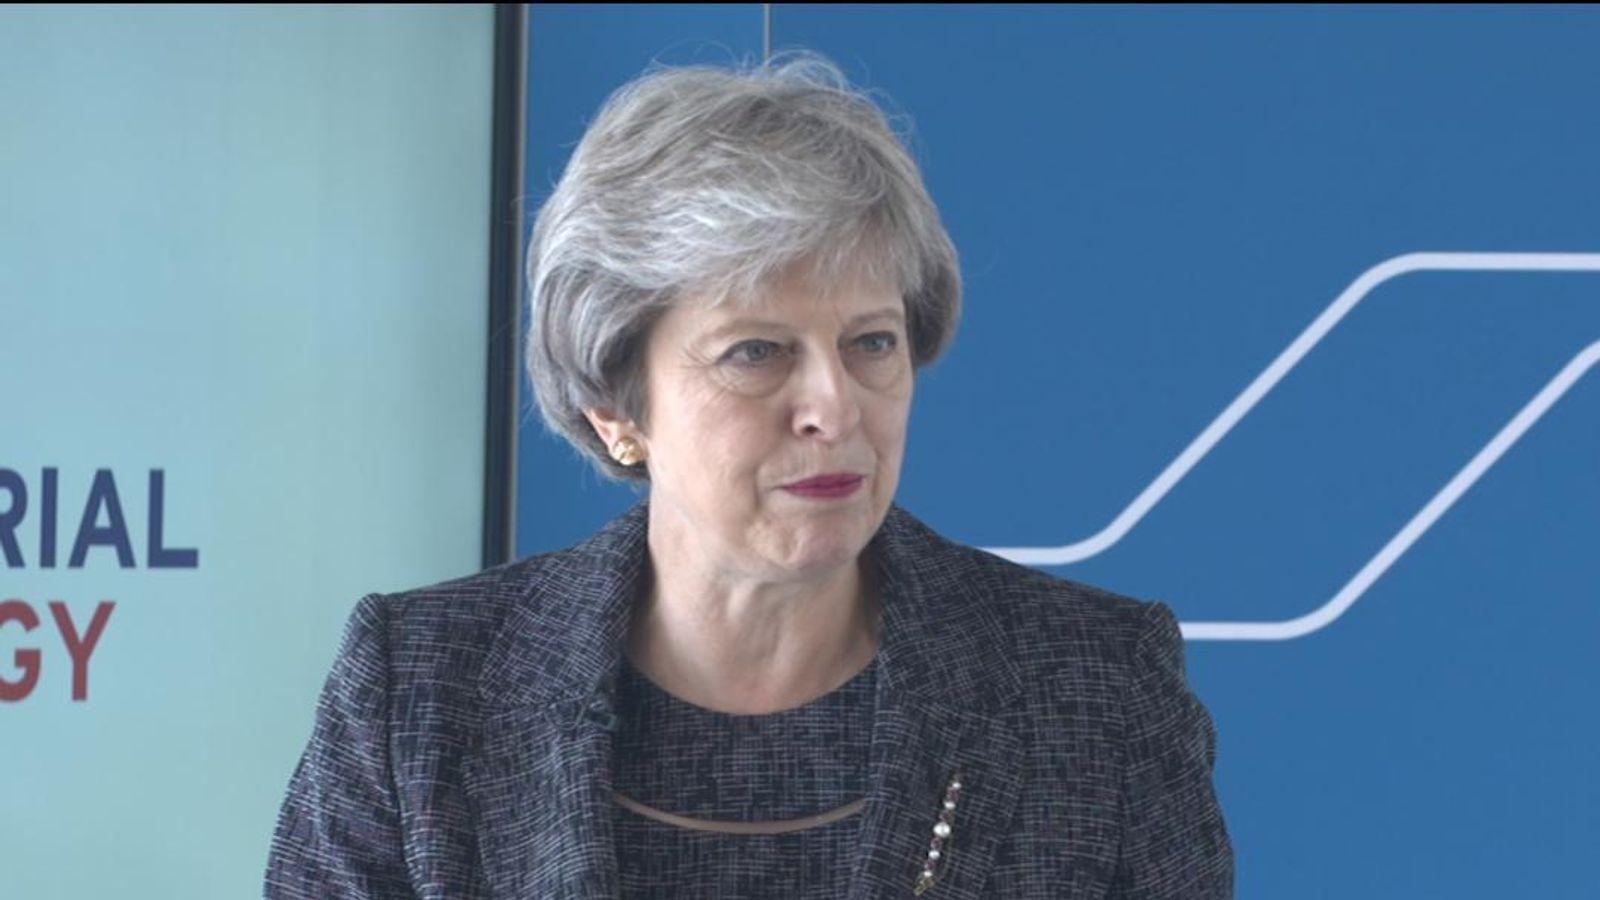 在The Times CEO峰会上错失了Theresa May的机会